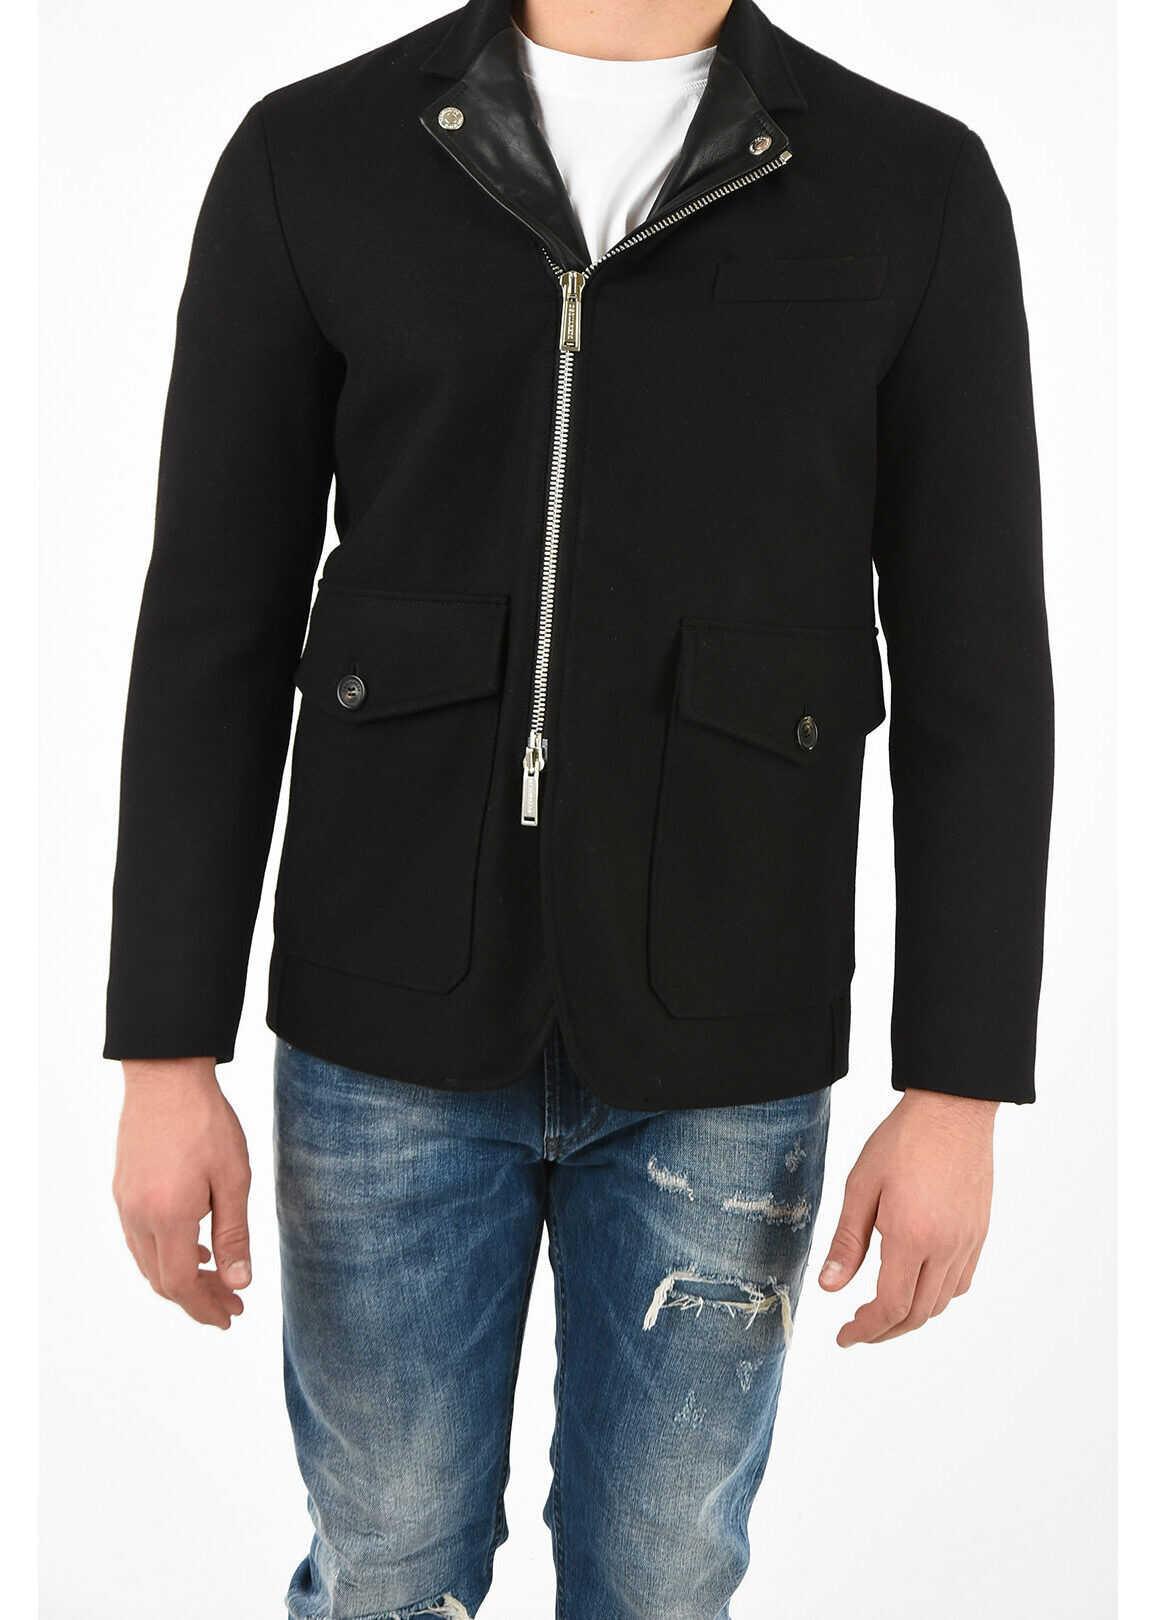 DSQUARED2 full zip coat with Leather Details BLACK imagine